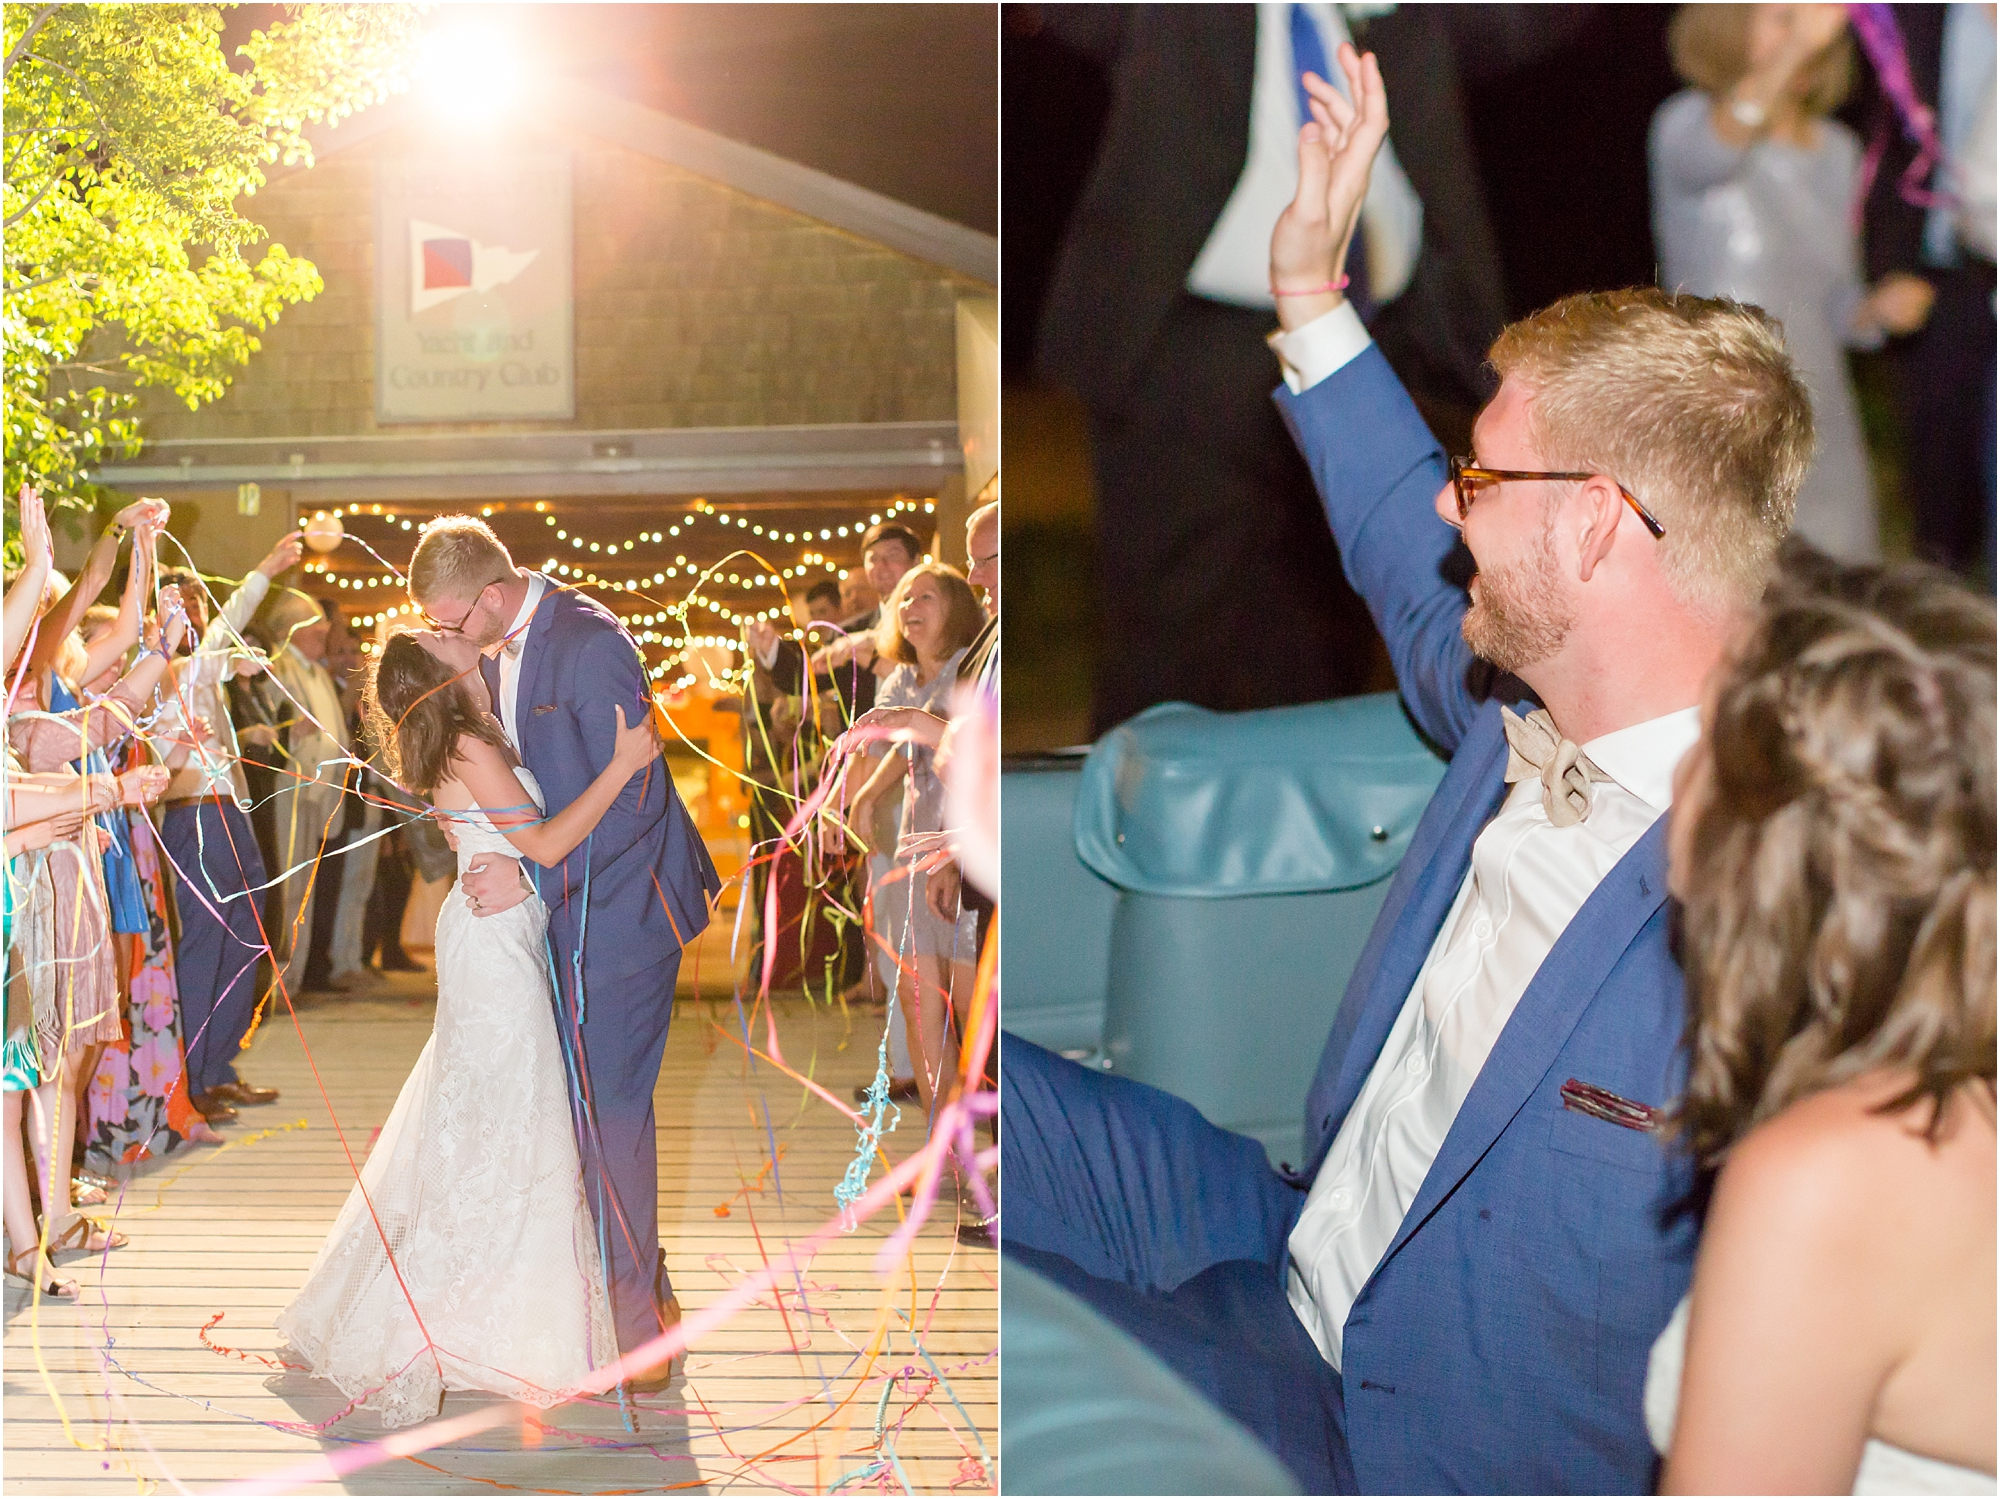 Goodman 7-Reception-1156_anna grace photography wellfleet cape cod massachusetts destination wedding photographer Chequessett Yacht and Country Club wedding photo.jpg